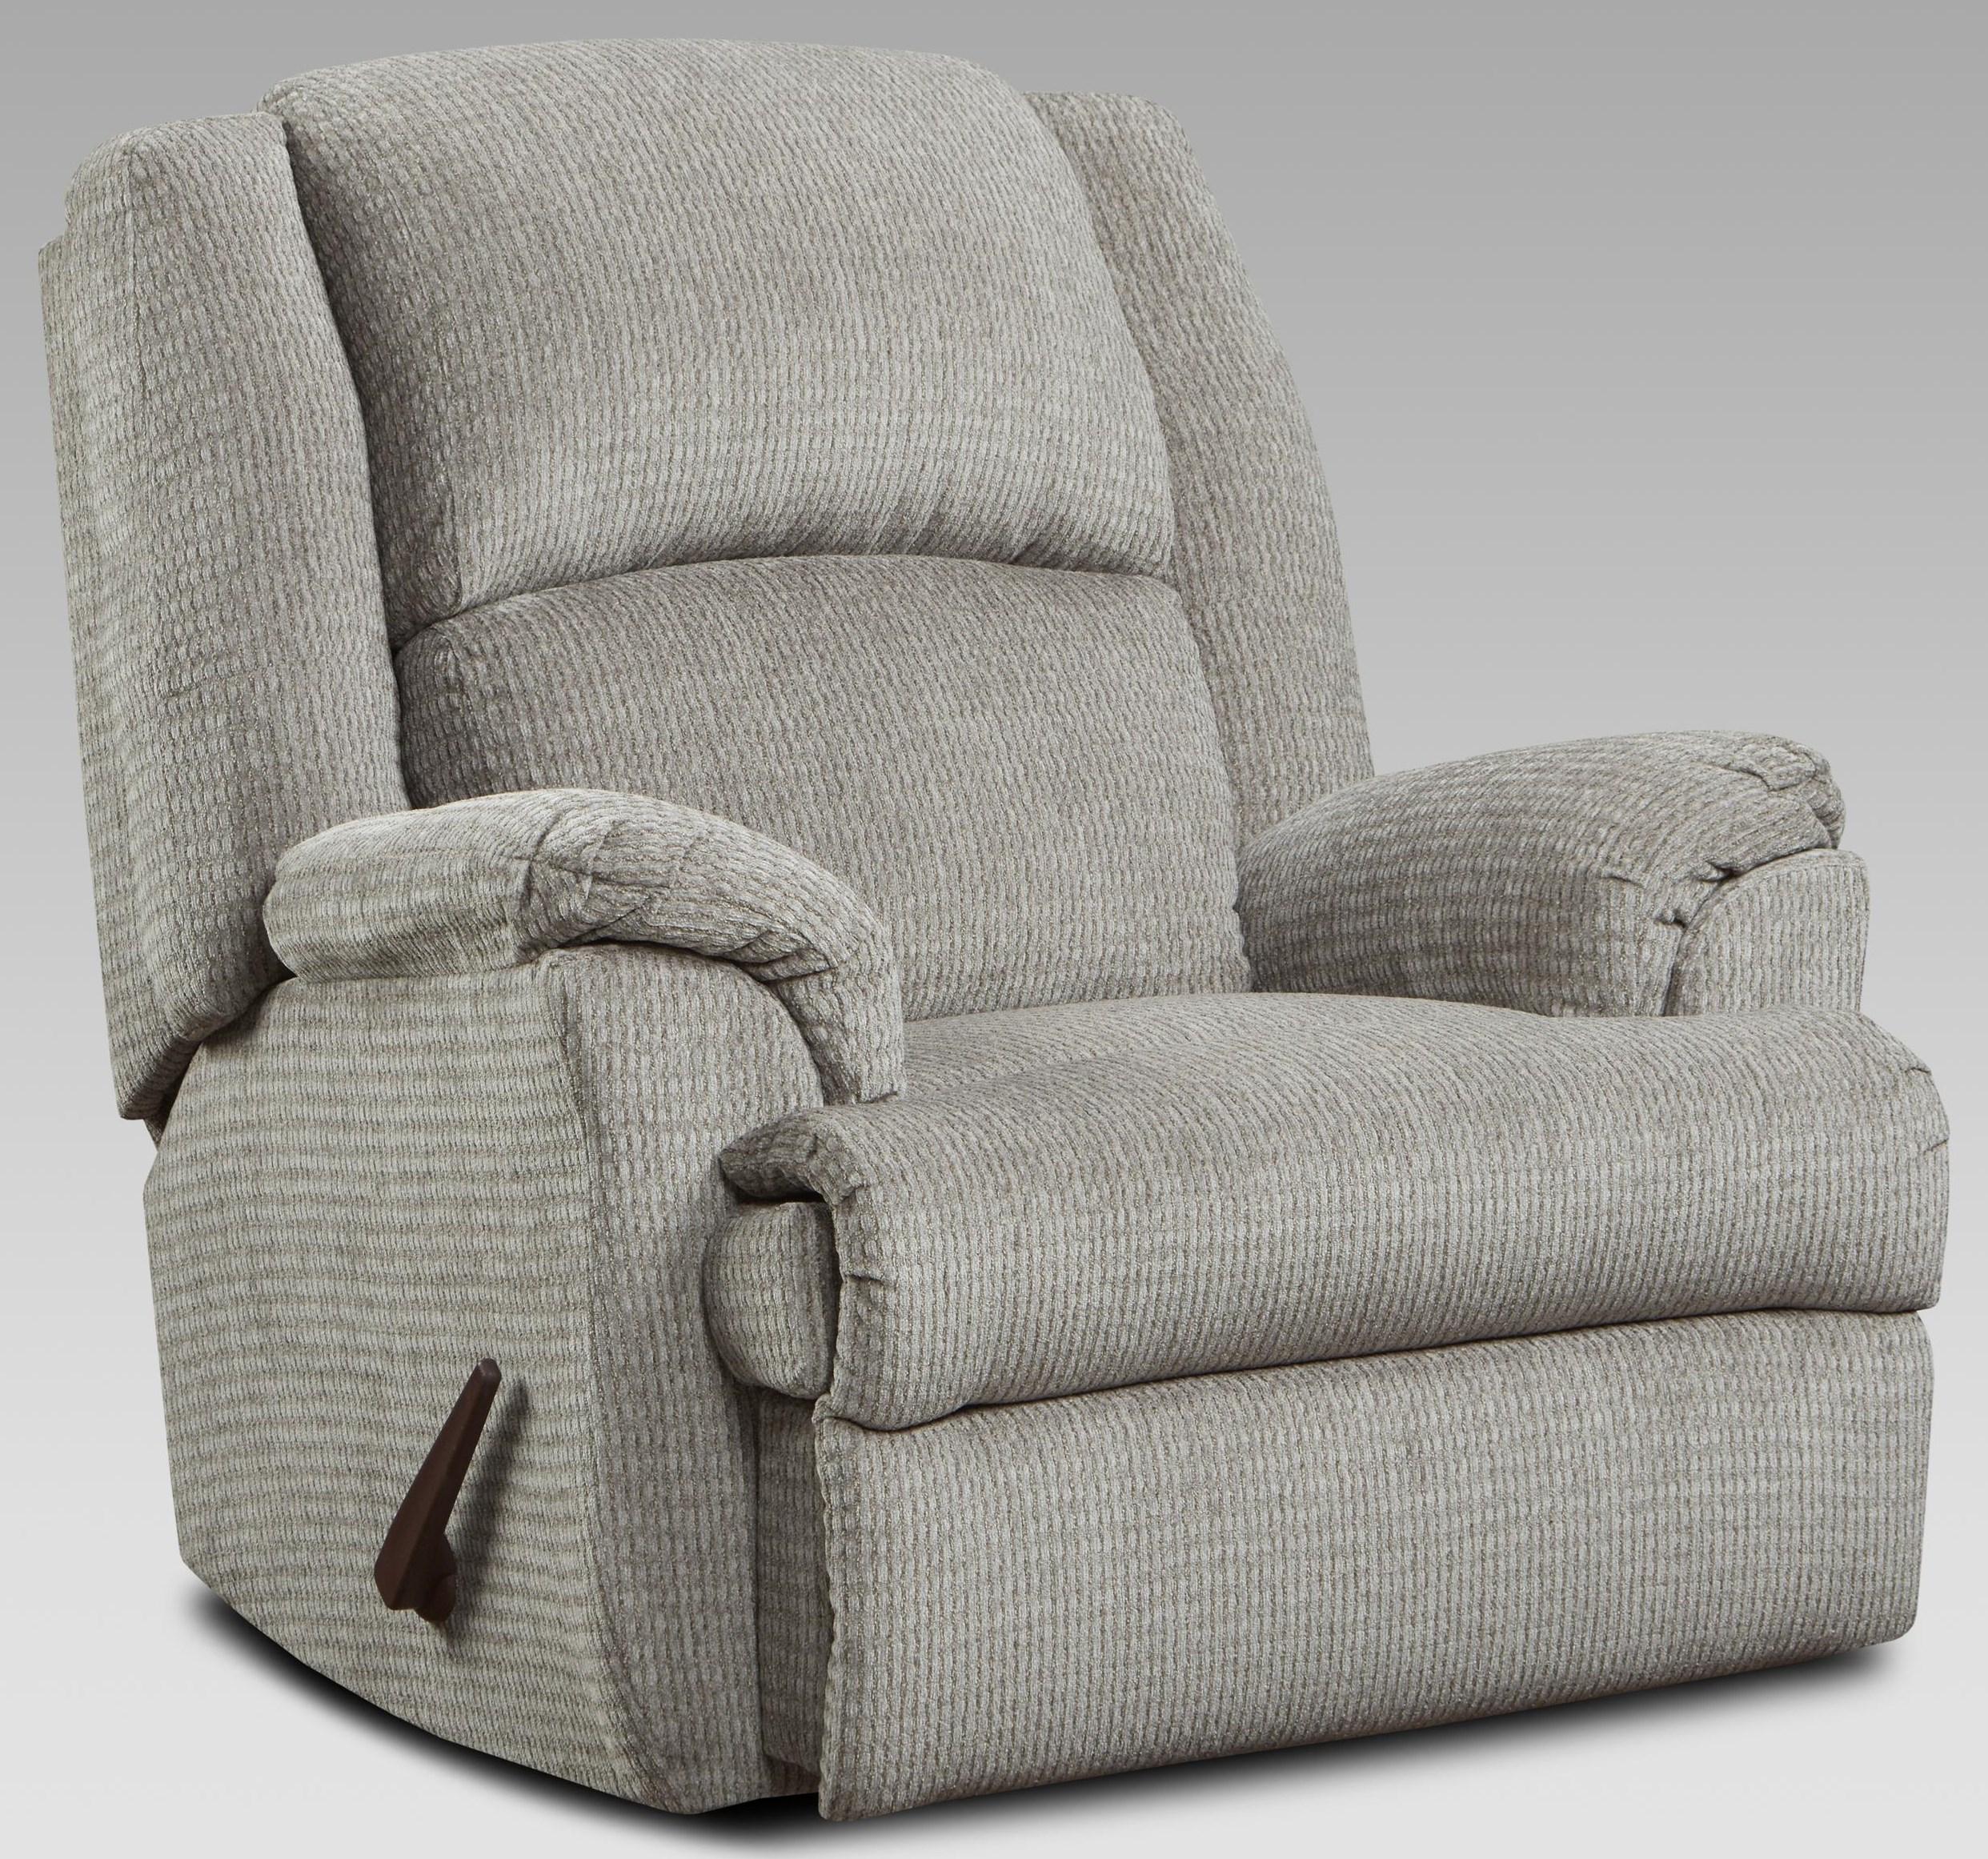 2600 2600 MINERAL RECLINER by Affordable Furniture at Furniture Fair - North Carolina